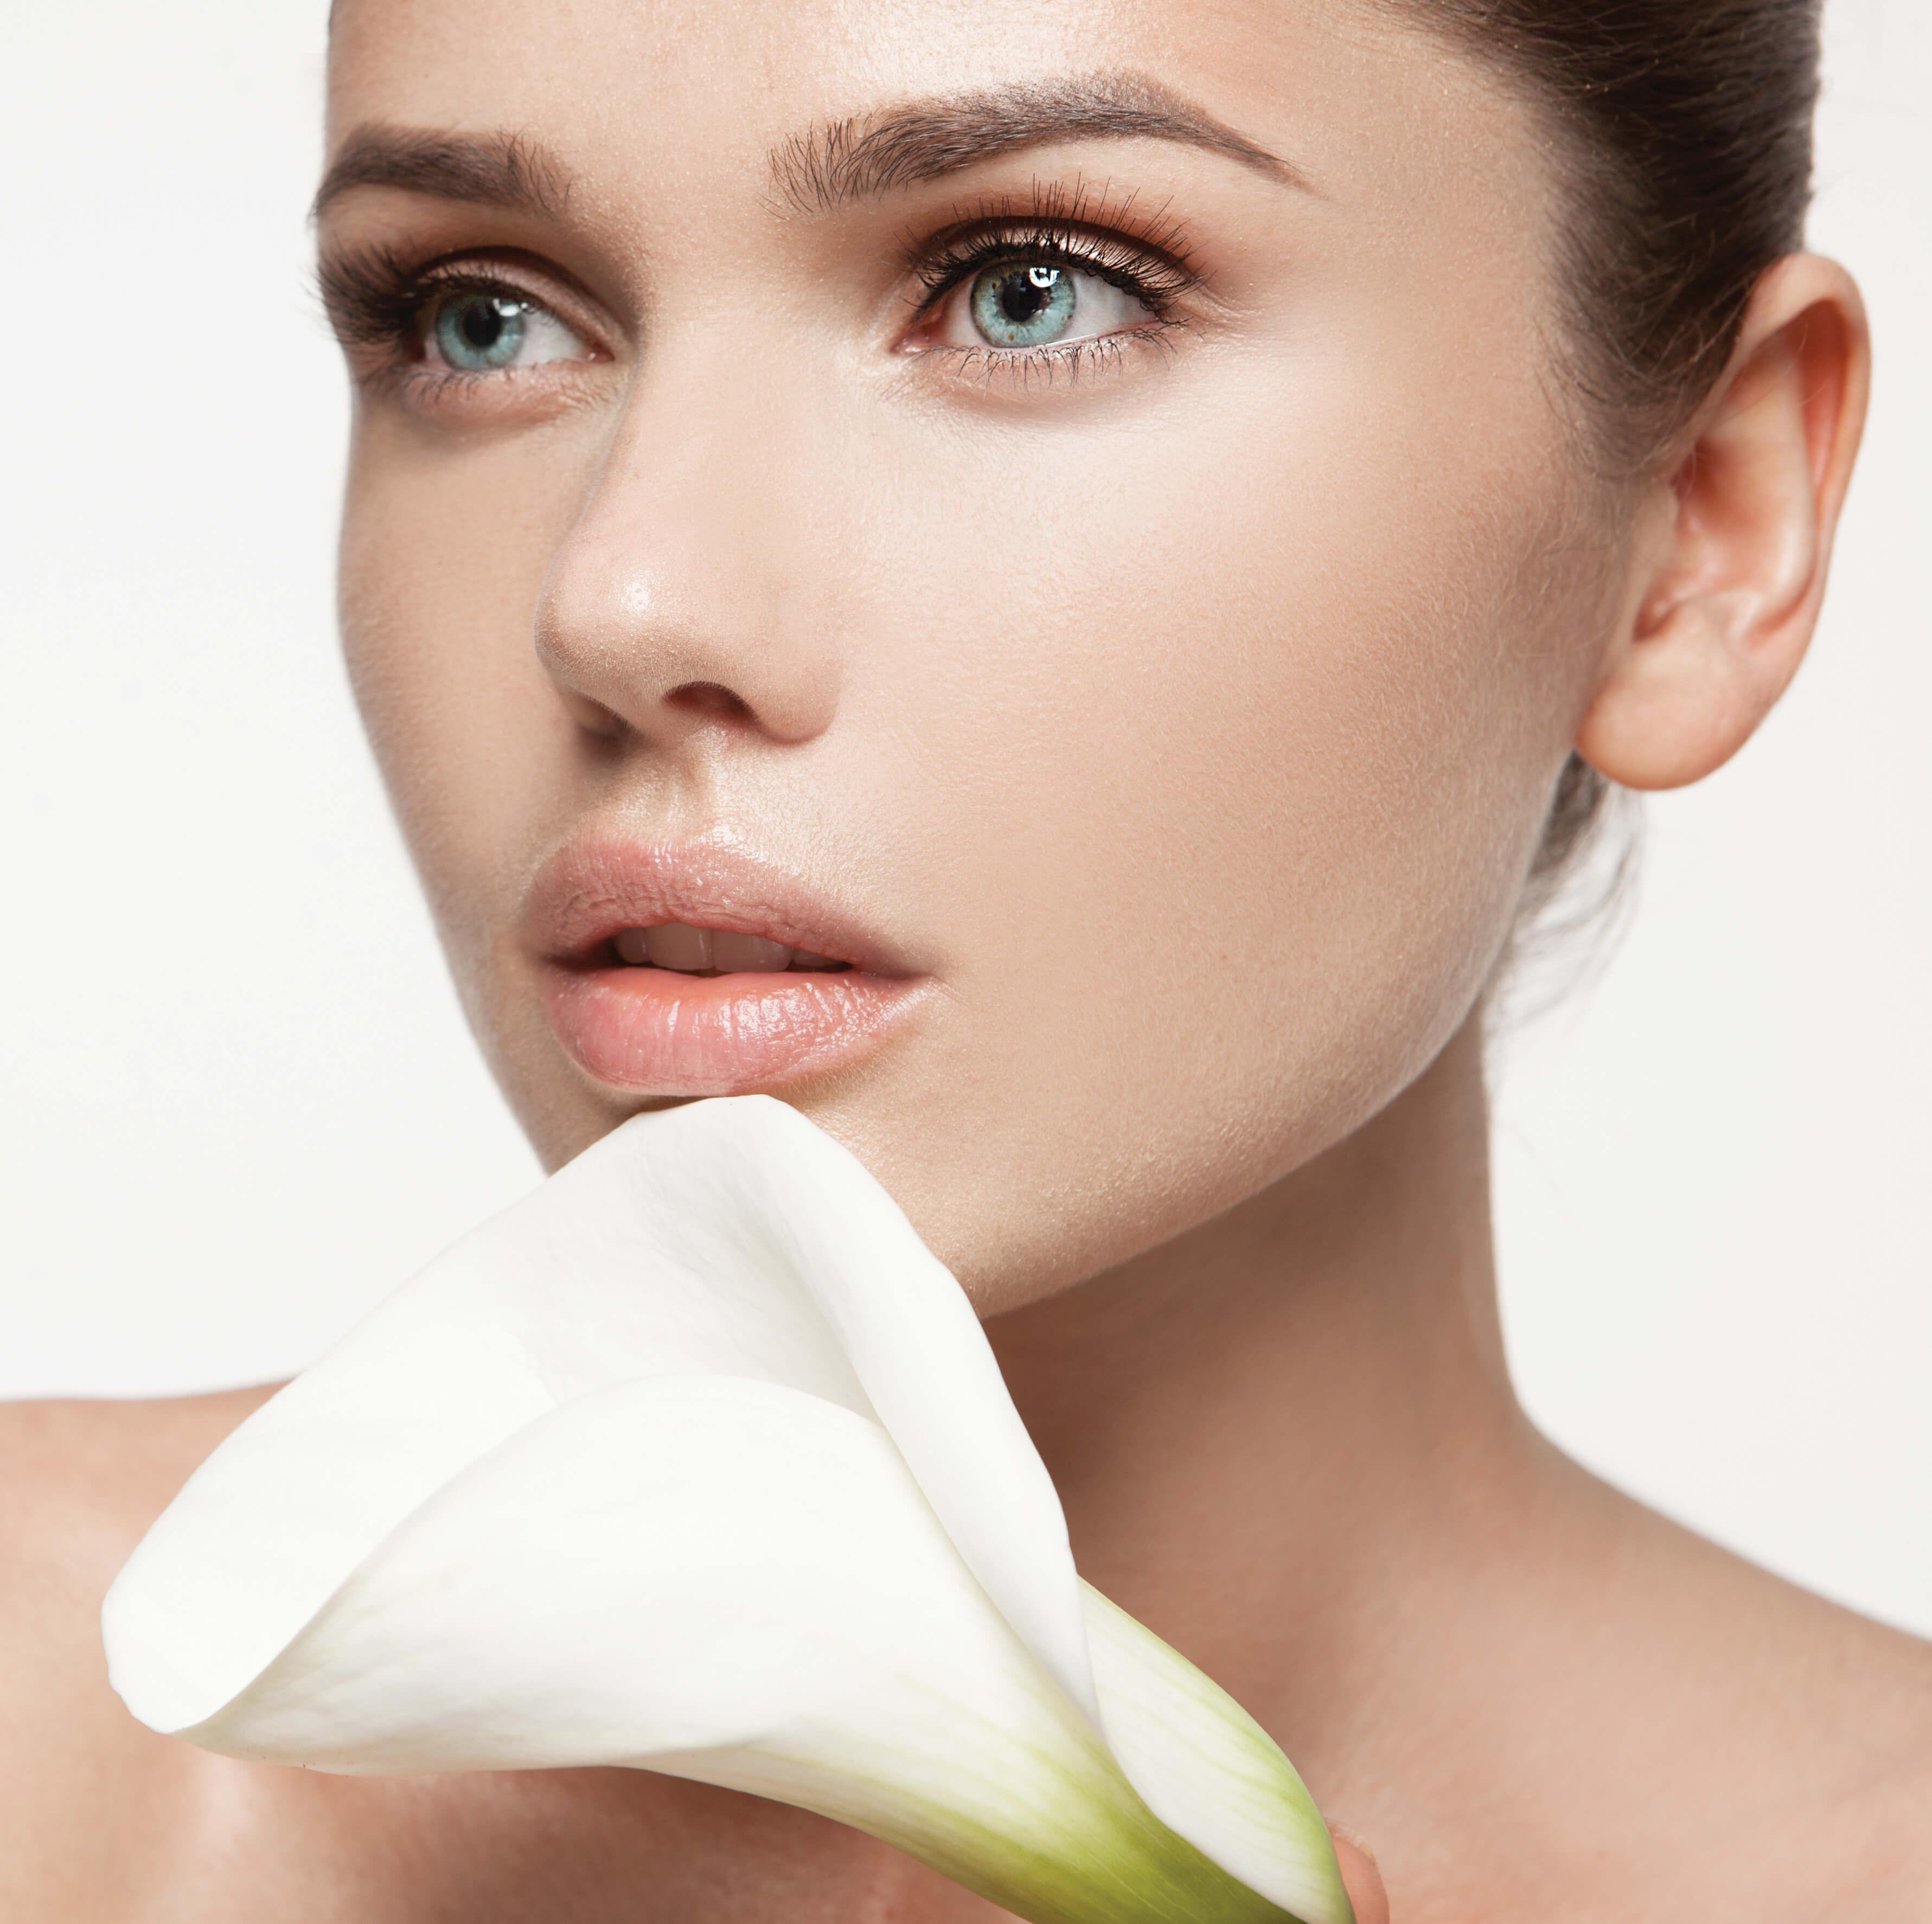 Sensitive Skin: Daily Care Rx For Sensitive Skin